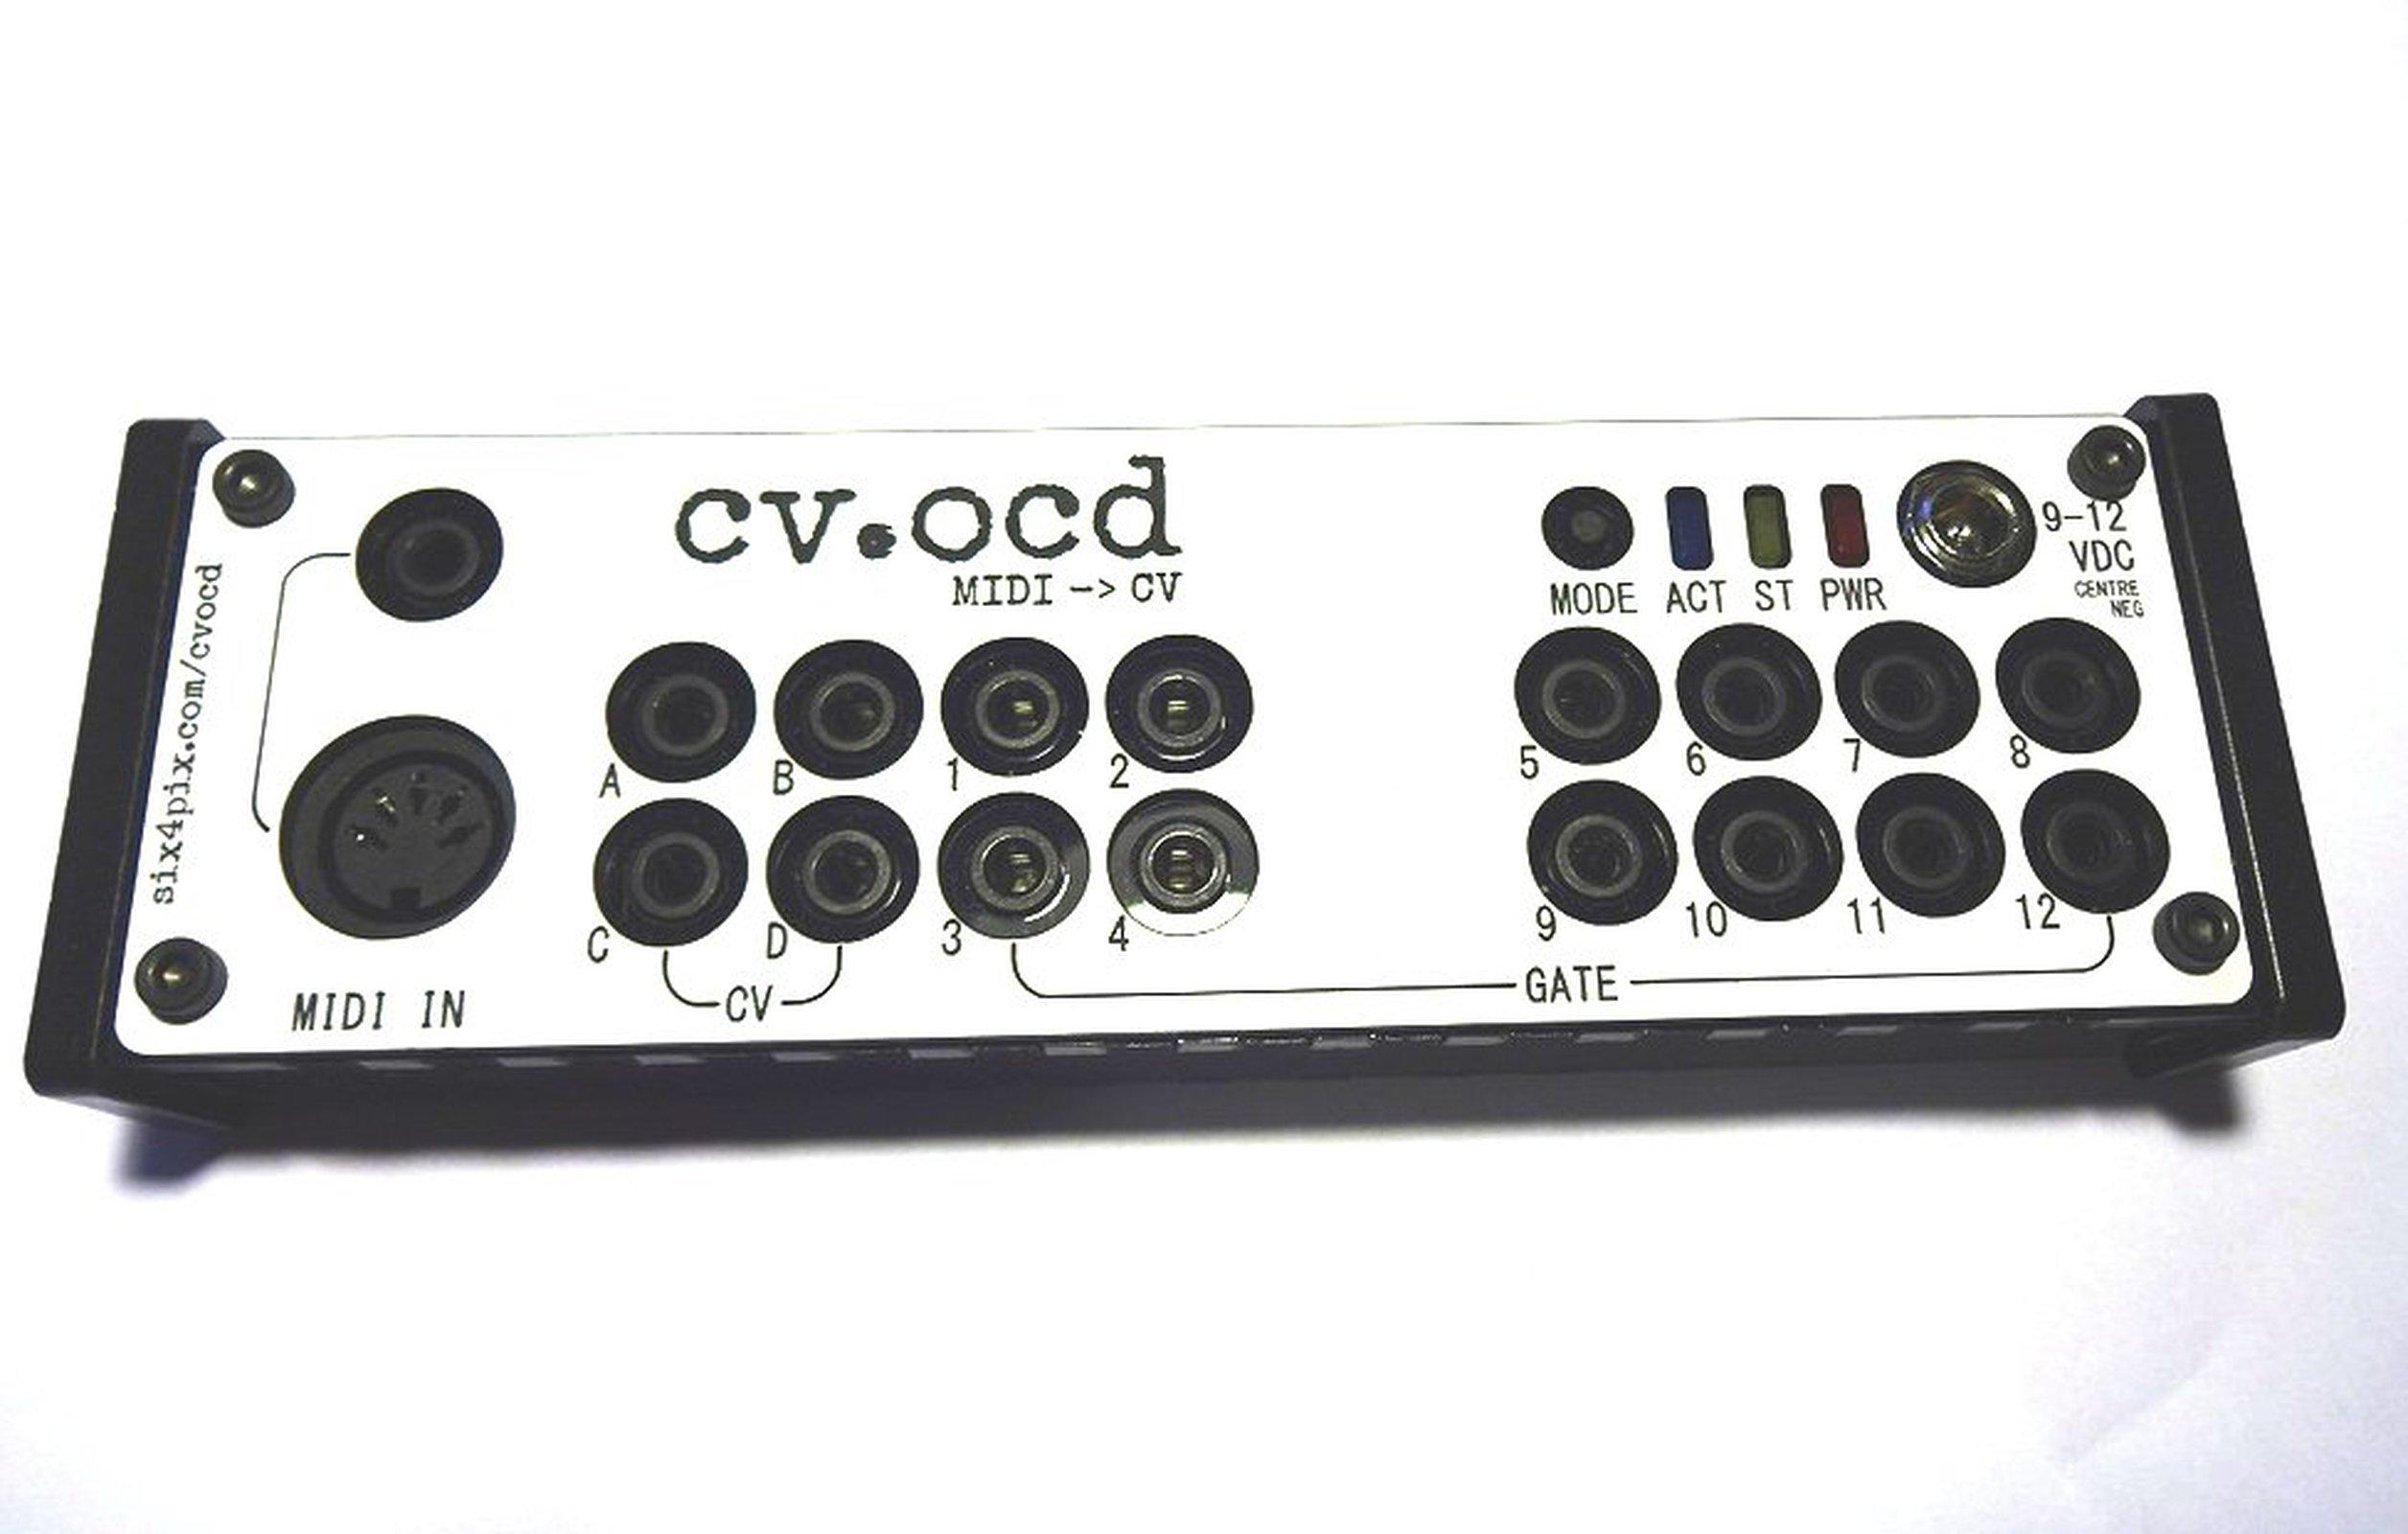 Cv Ocd A Super Flexible Midi To Cv Box From Sixty Four